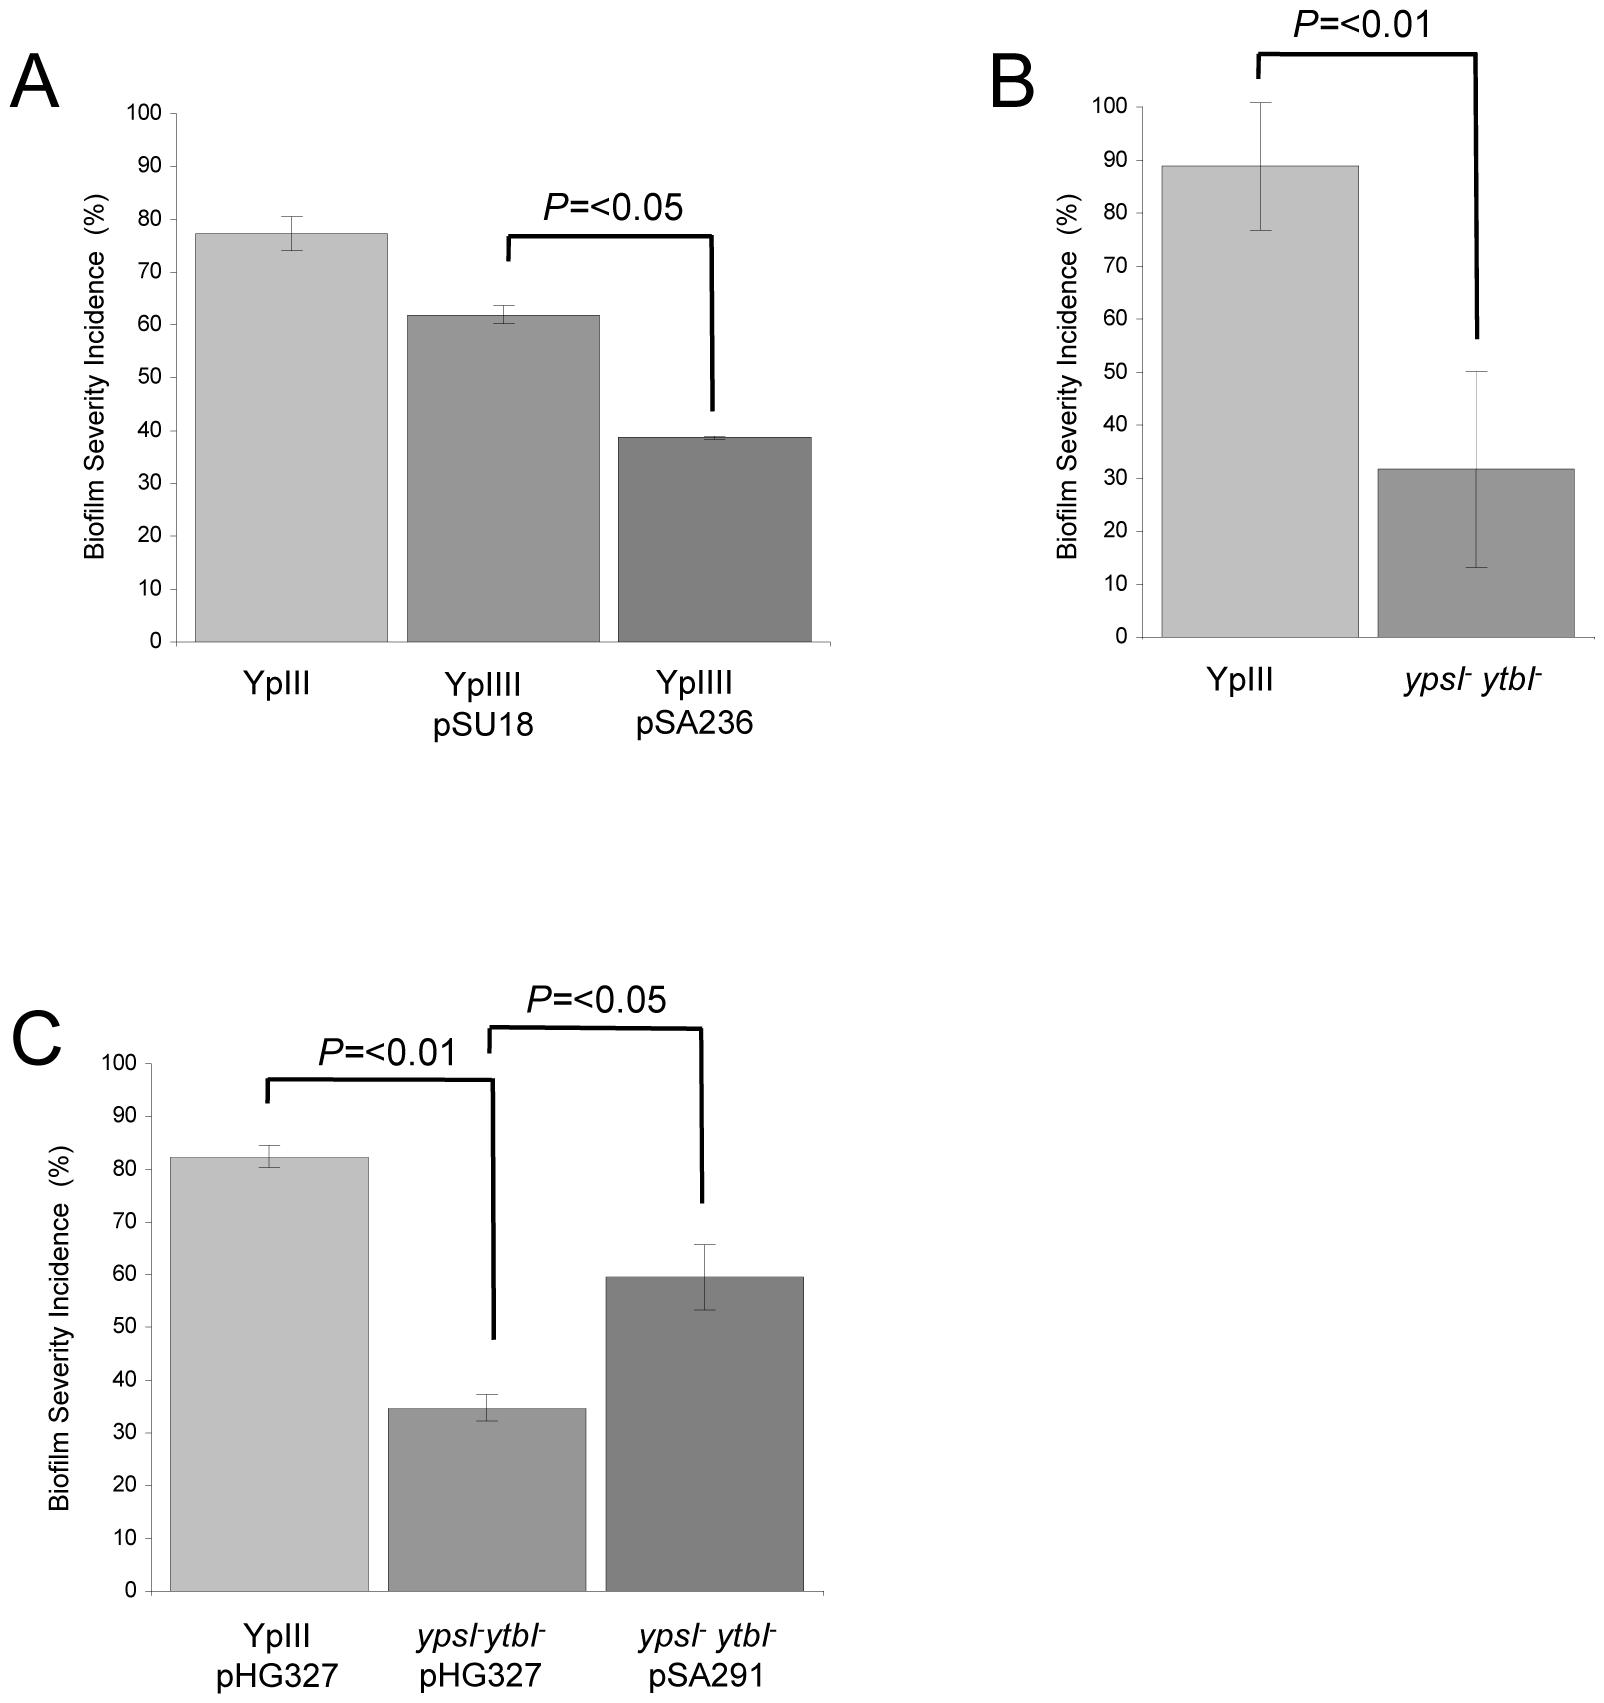 QS controls <i>Y. pseudotuberculosis</i> biofilm formation on <i>C. elegans.</i>